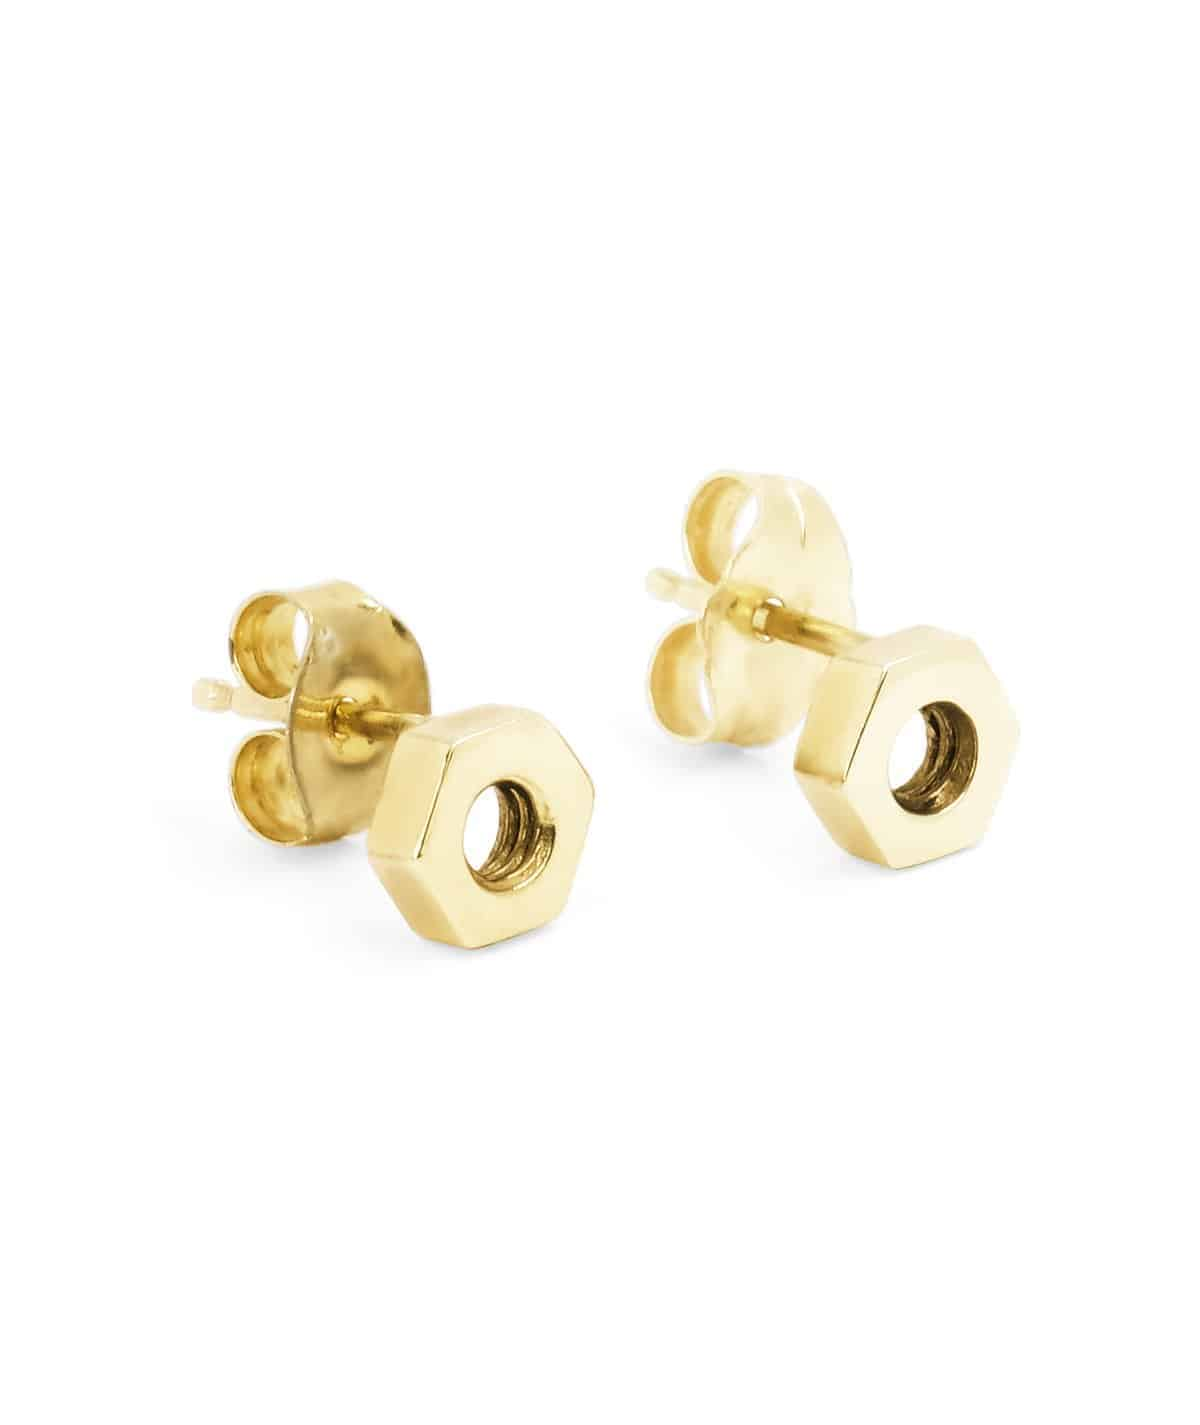 yellow gold hex stud earrings